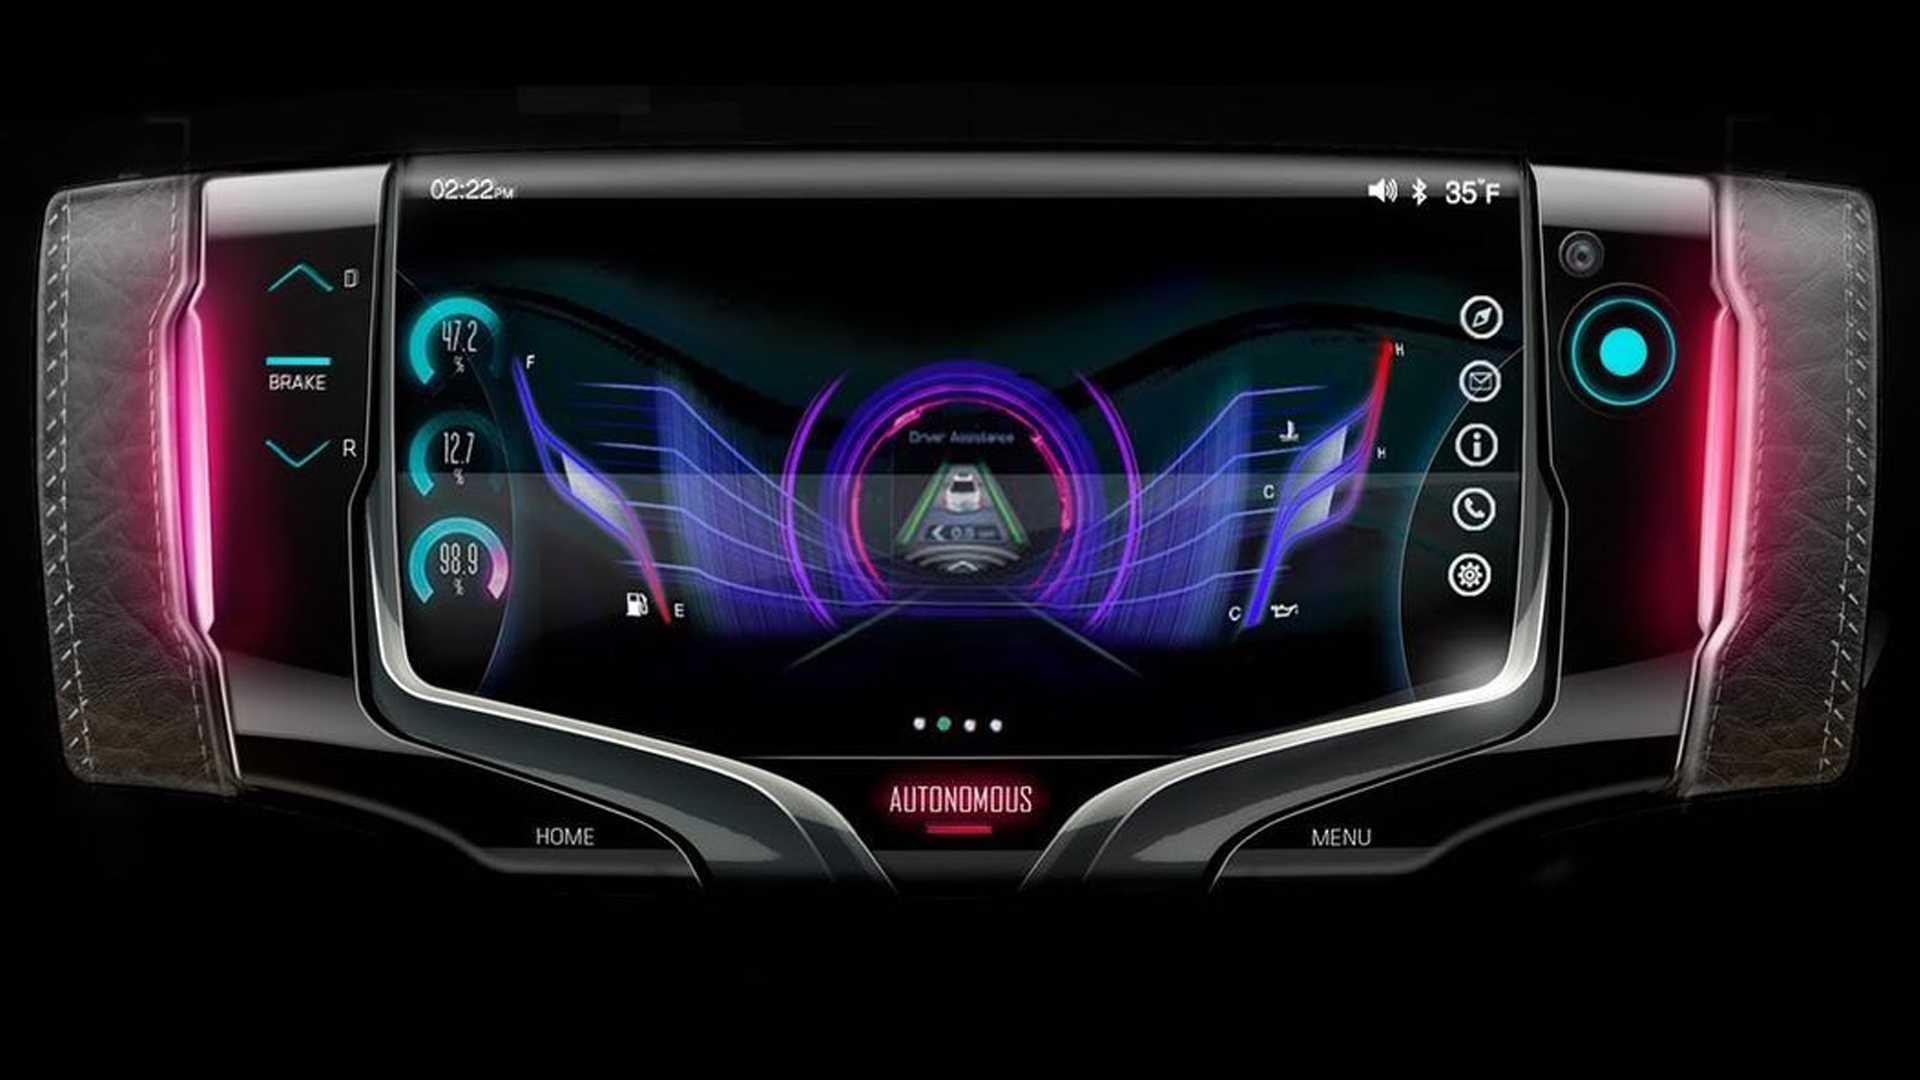 To νέο τιμόνι της General Motors είναι για αυτοκίνητο ή για βιντεοπαιχνίδια; (pics)